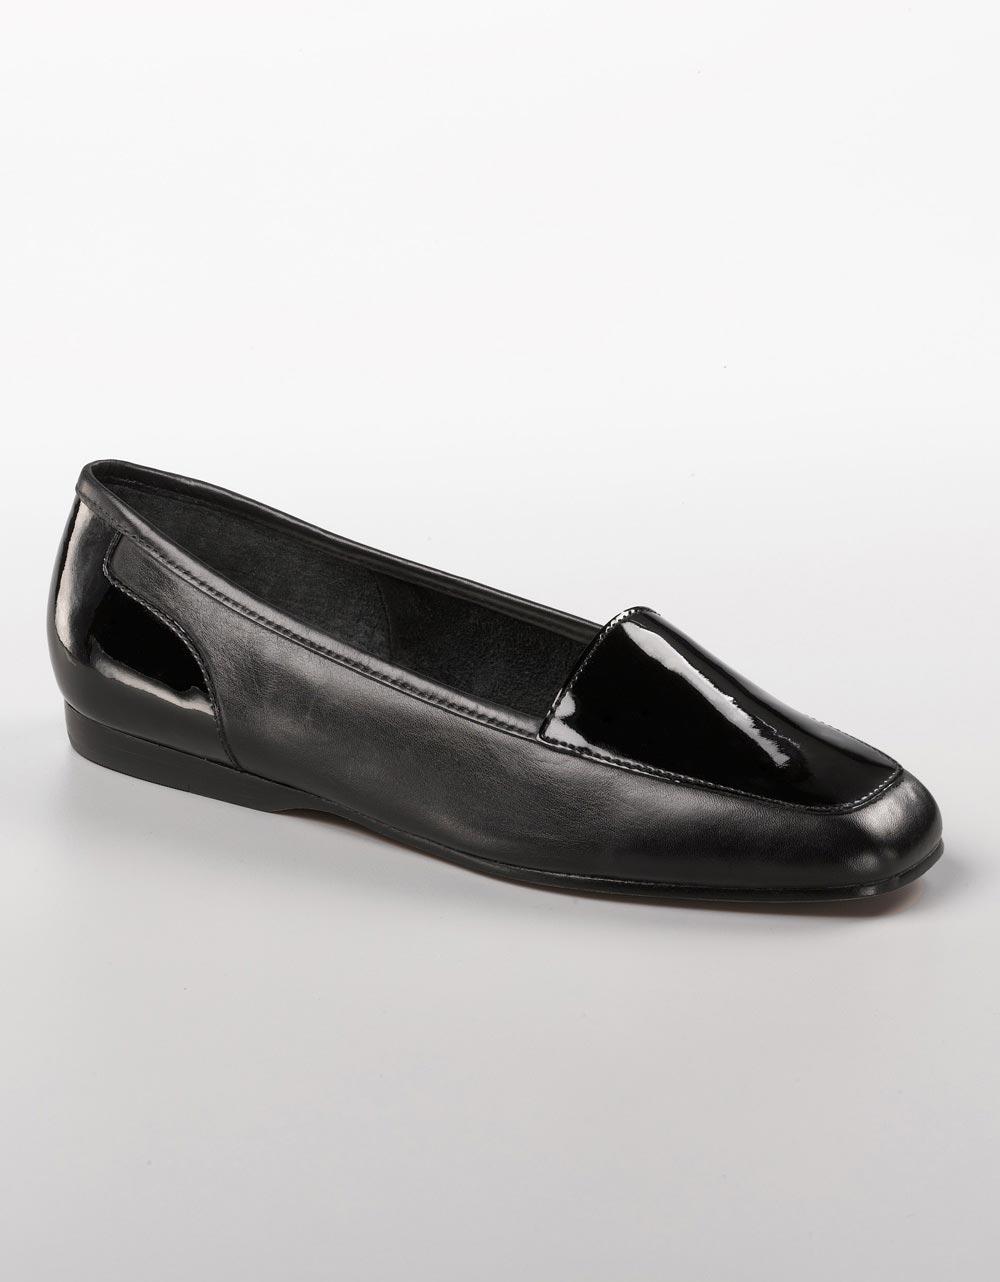 Enzo Angiolini Liberty Shoes Black